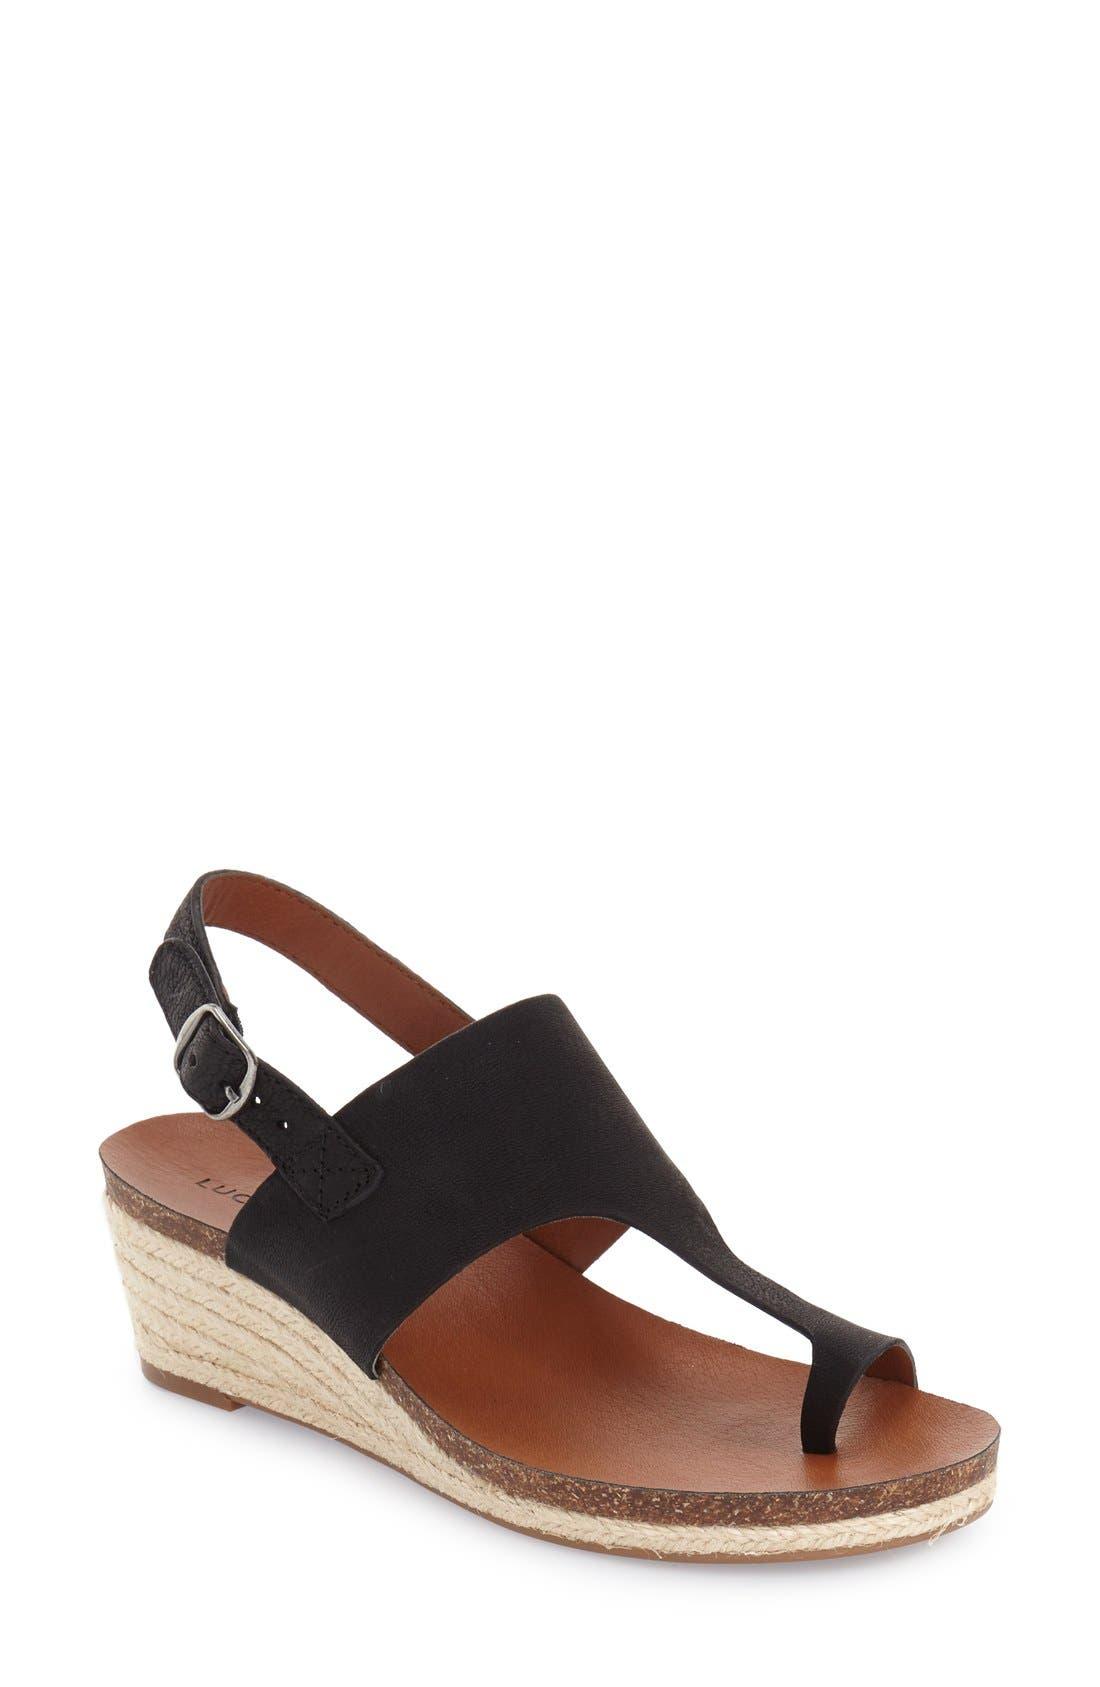 Main Image - Lucky Brand 'Janessa' Espadrille Wedge Sandal (Women)